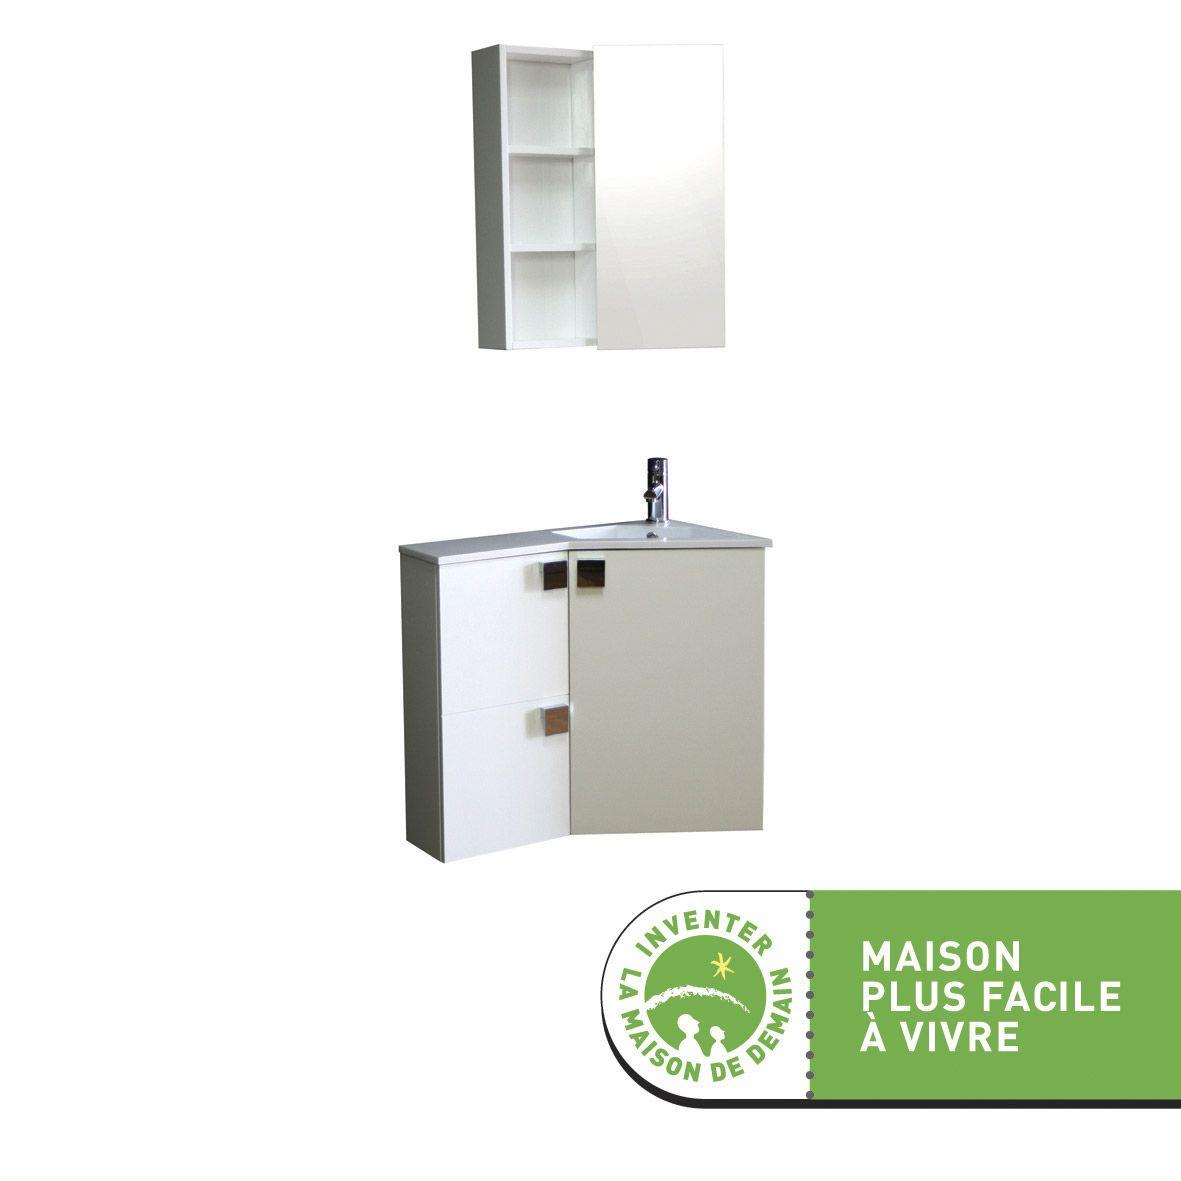 Meuble Sous Vasque Corner Blanc Meuble Sous Vasque Meuble Salle De Bain Mobilier De Salon